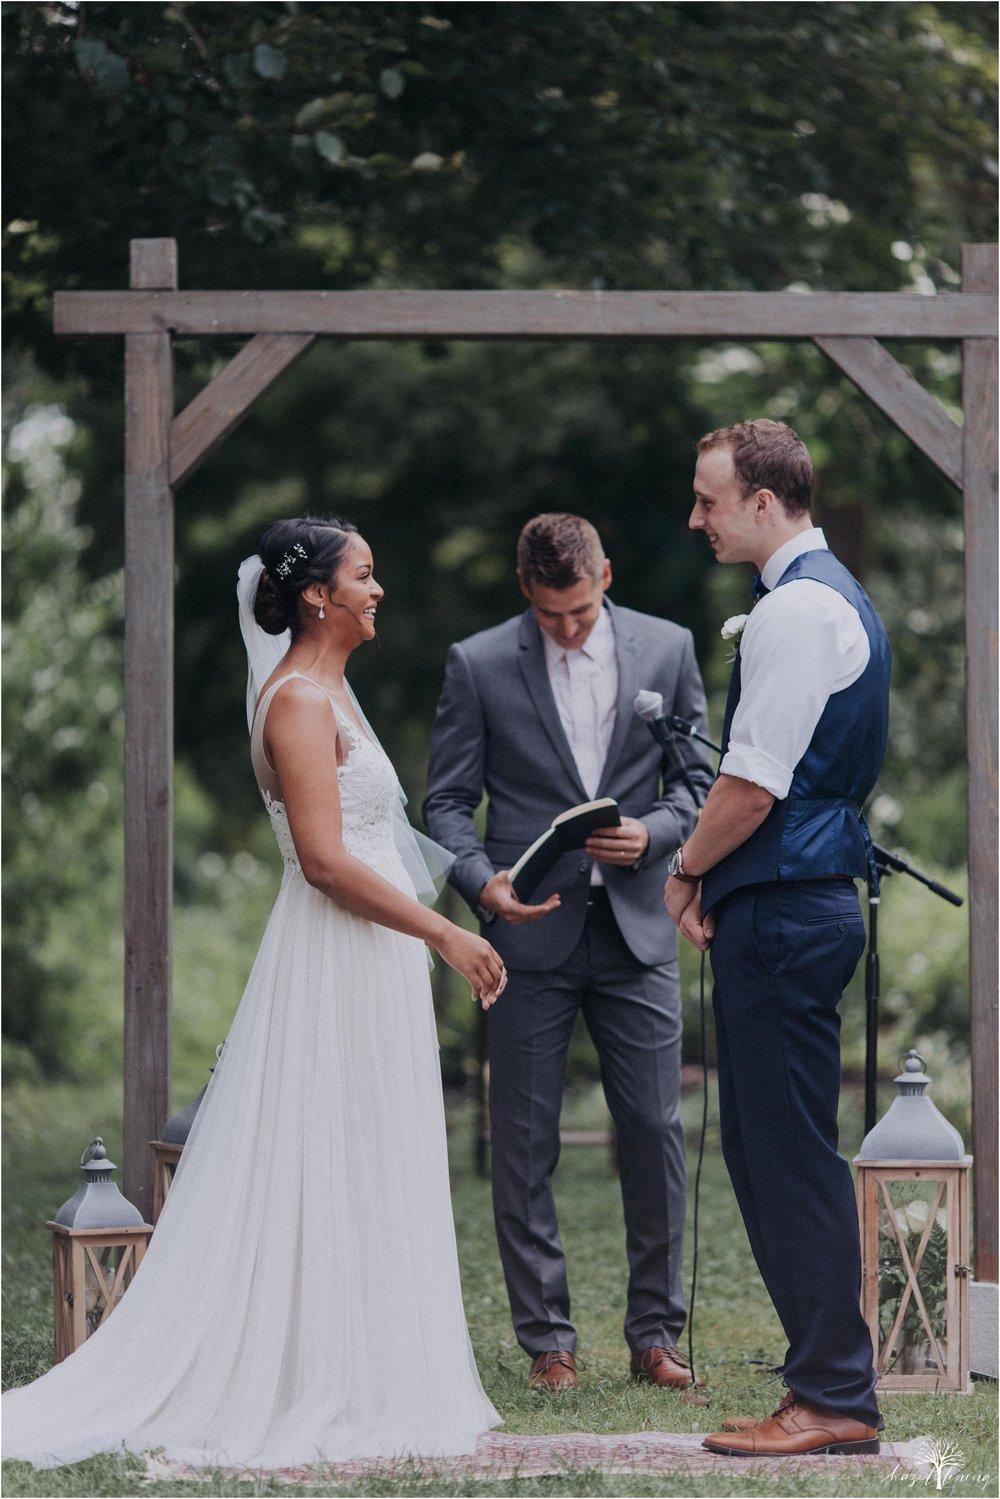 mariah-kreyling-samuel-sherratt-sherrattwiththeworld-peirce-farm-at-witch-hill-boston-massachusetts-wedding-photography-hazel-lining-travel-wedding-elopement-photography_0098.jpg